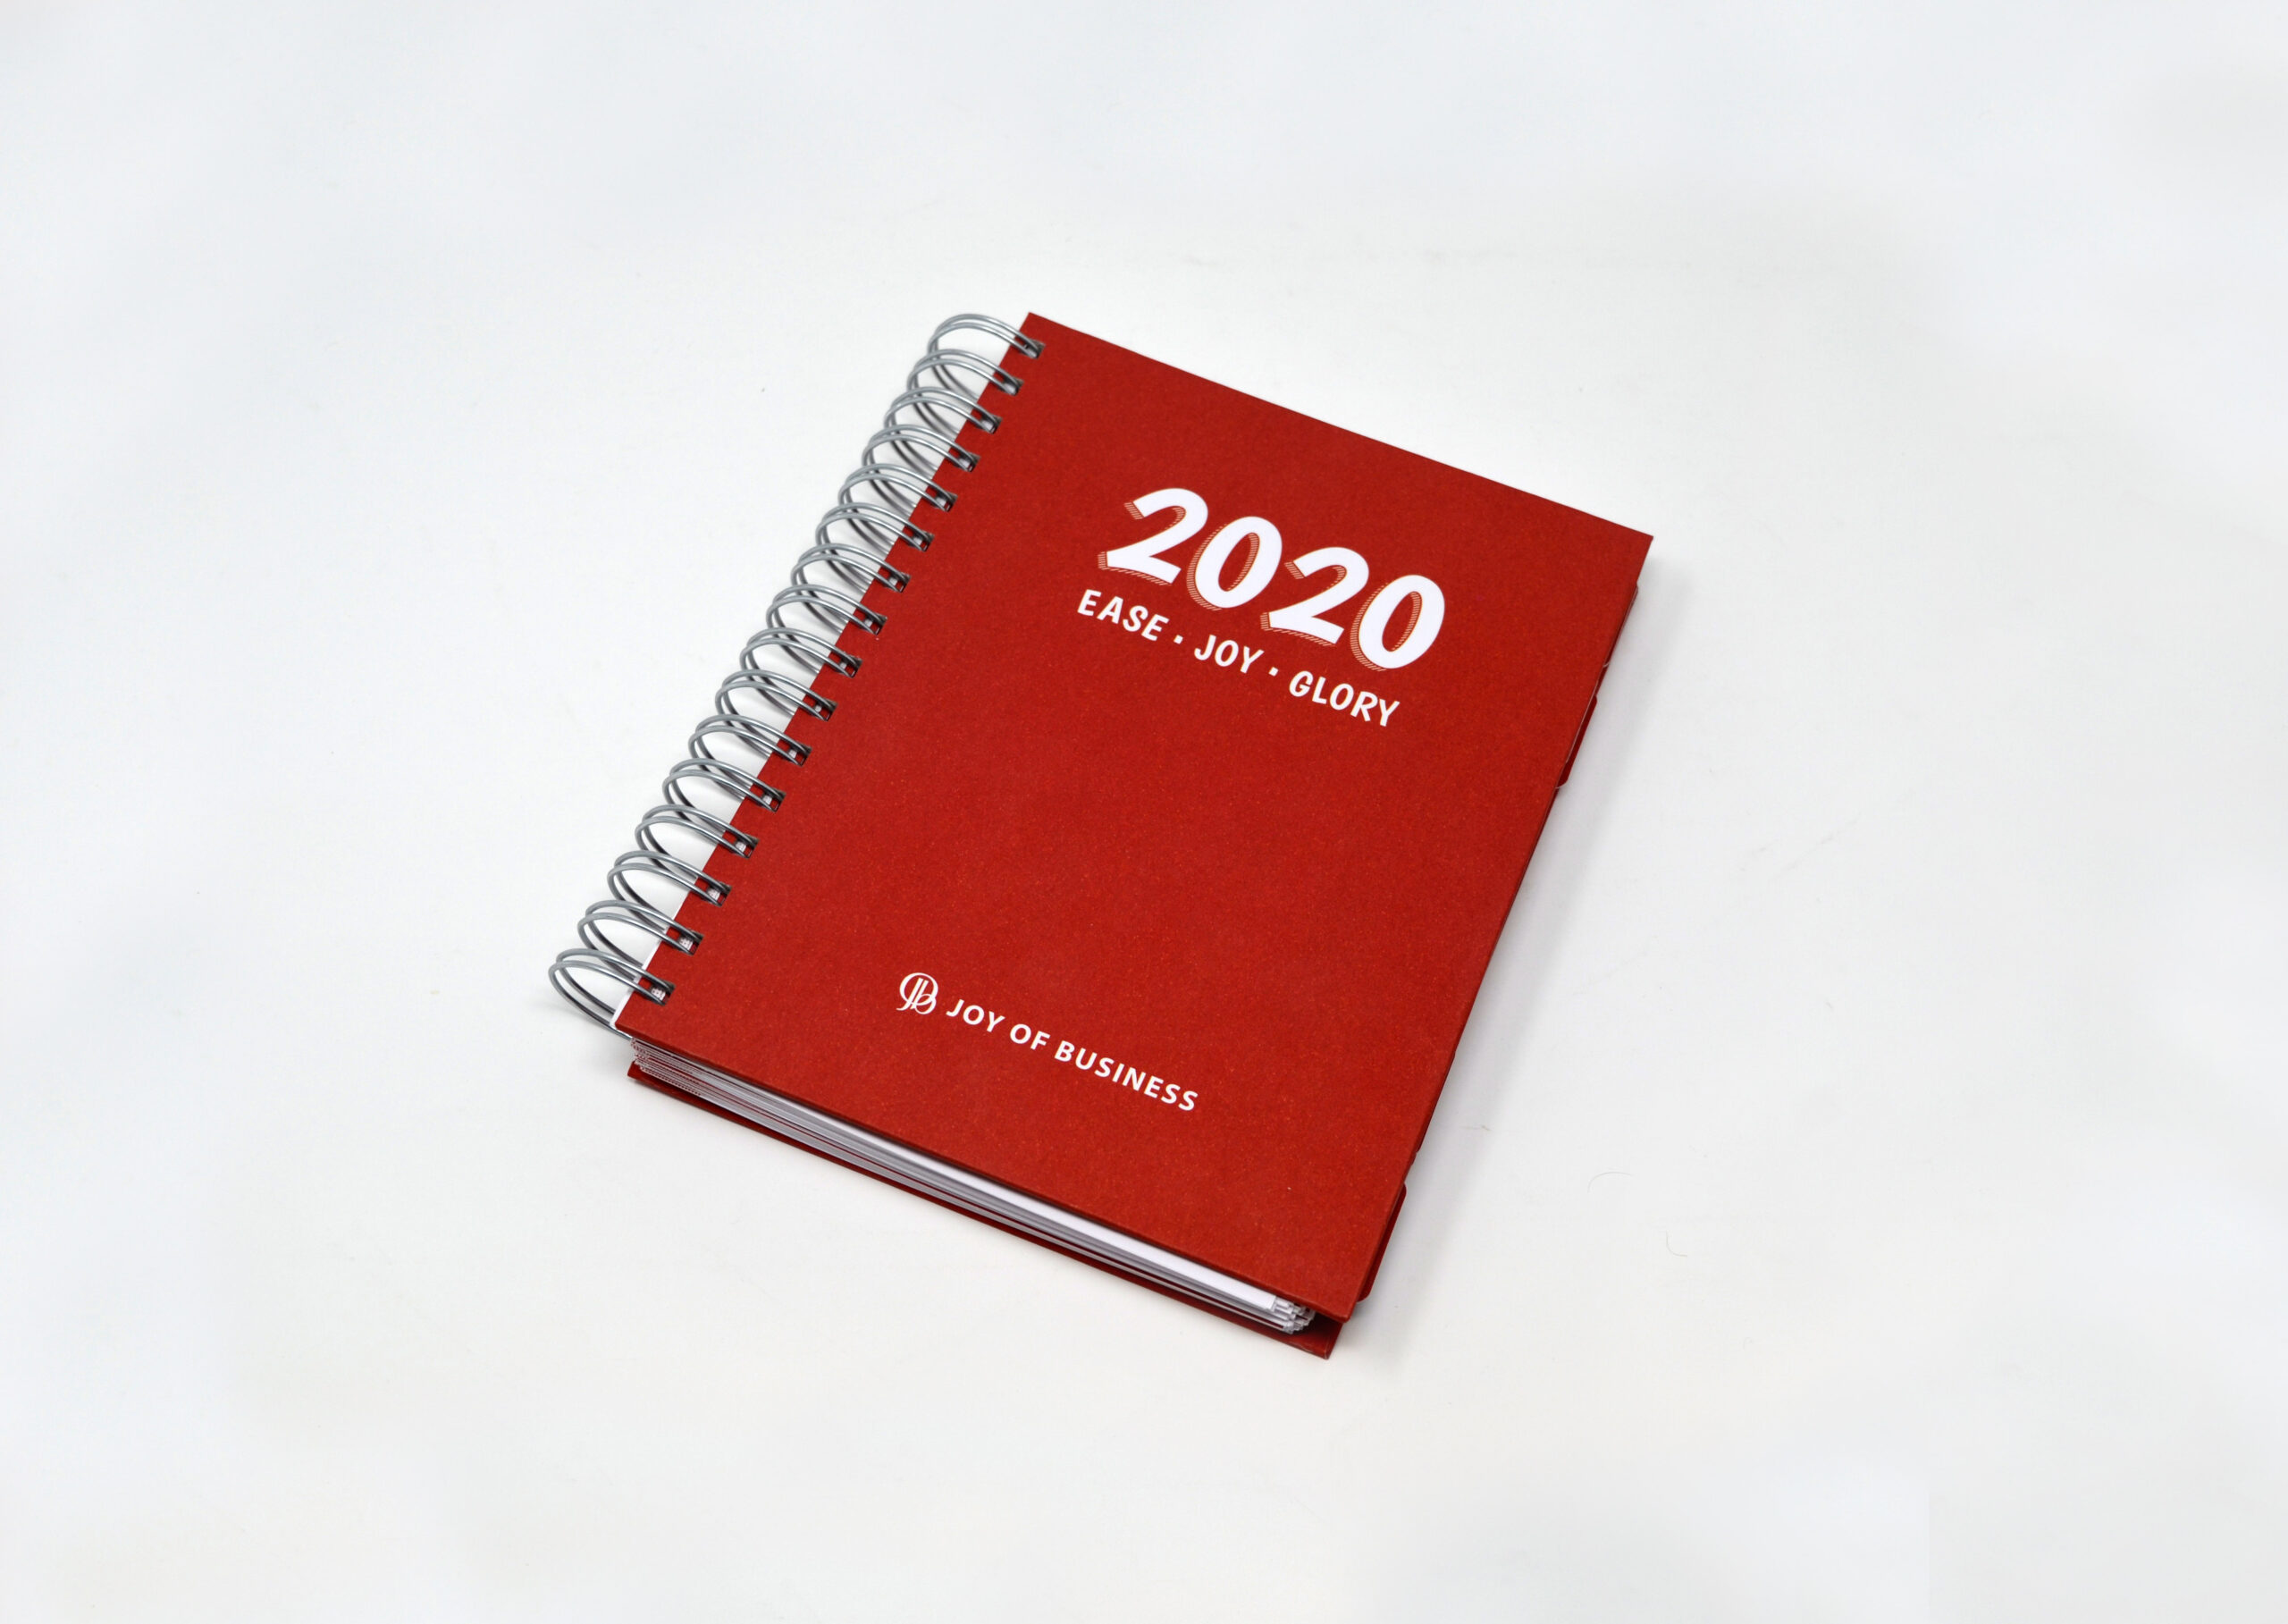 Wiro-bound Diary Cover